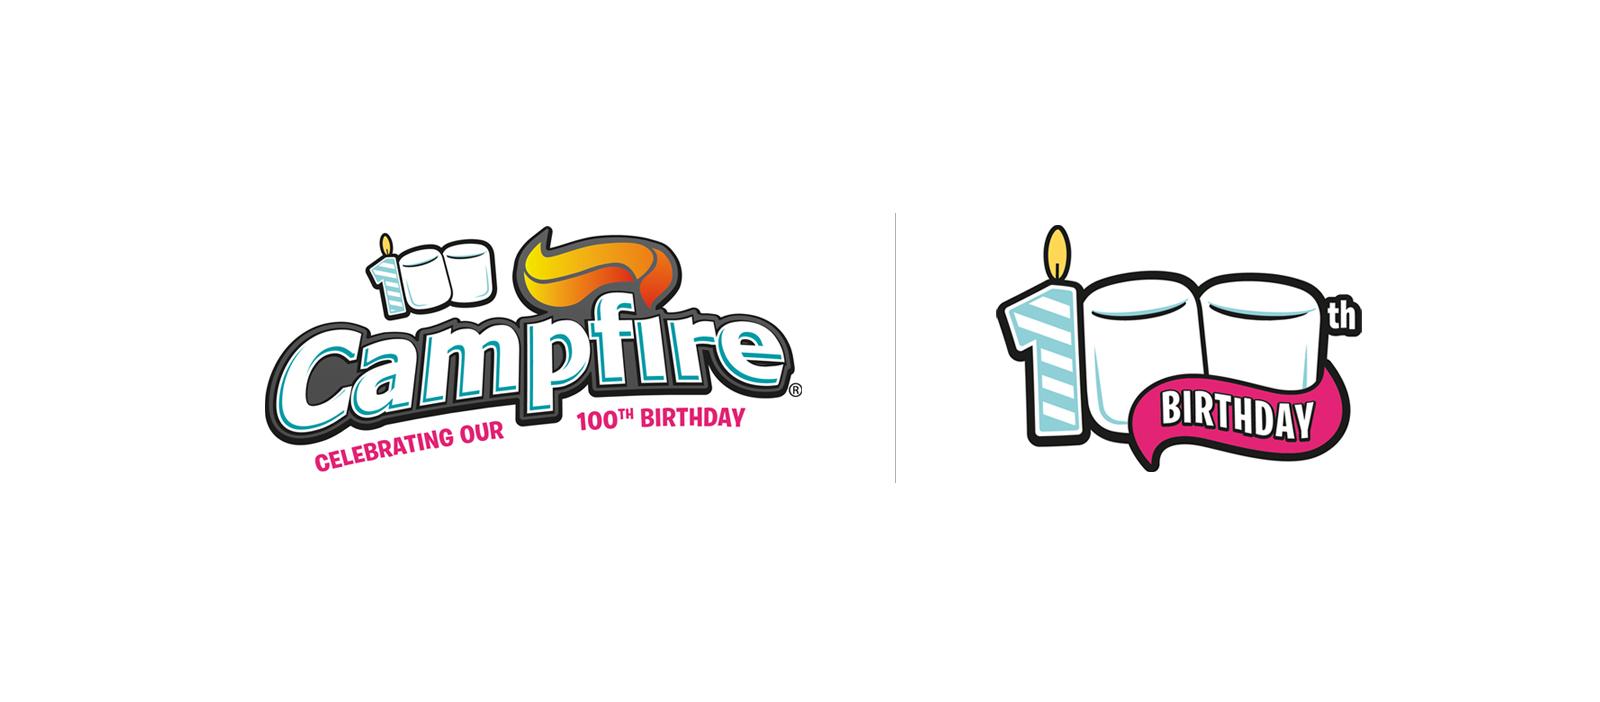 Campfire 100th birthday logos